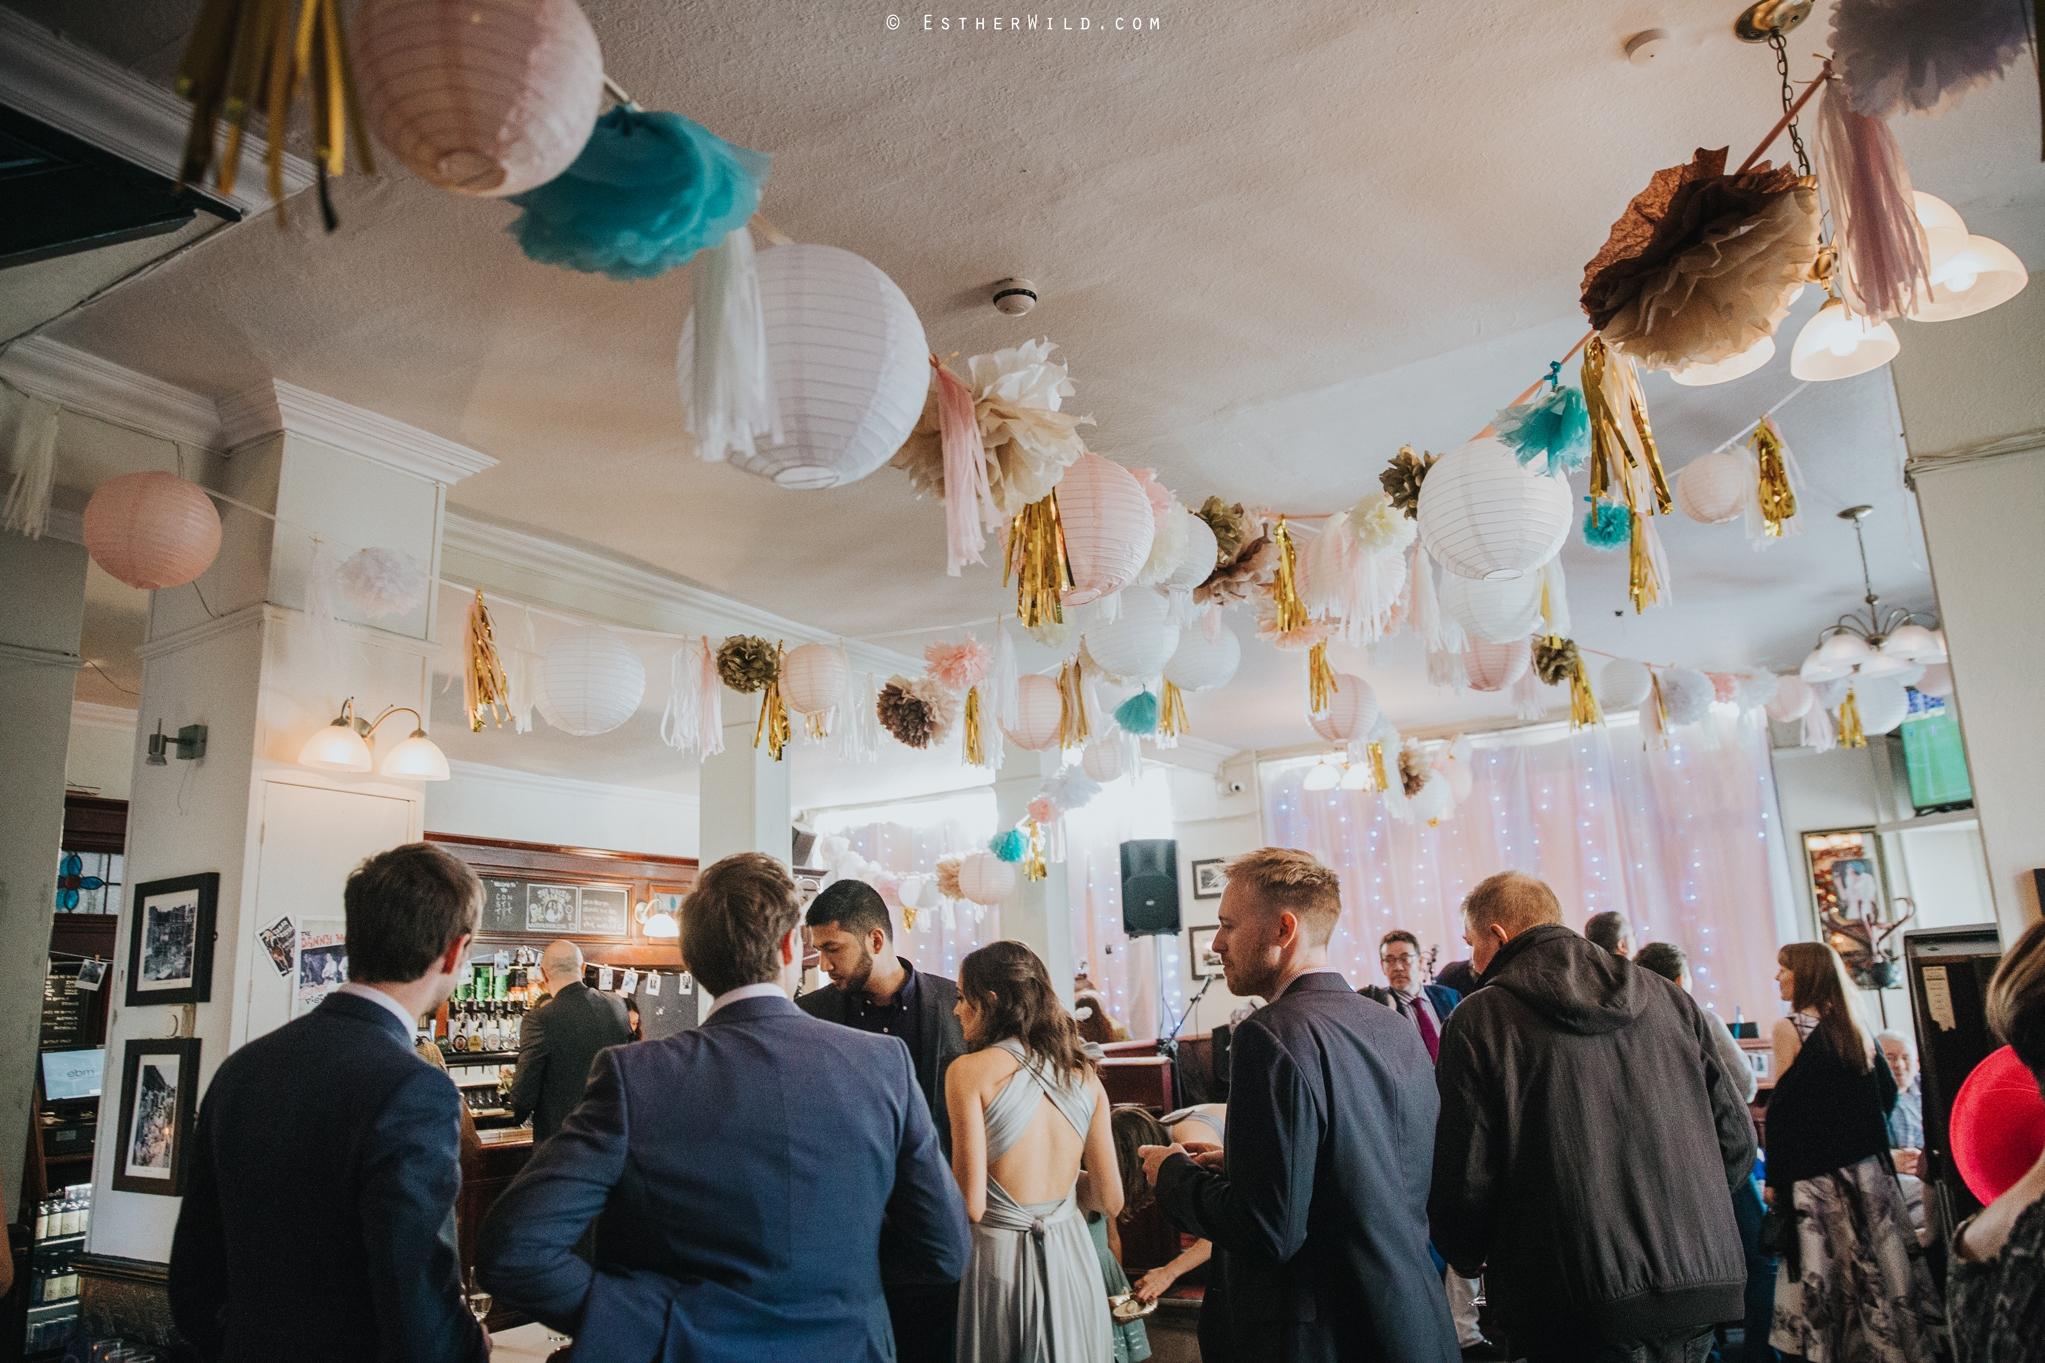 Islington_Town_Hall_Wedding_London_Photographer_Esther_Wild_IMG_7328.jpg